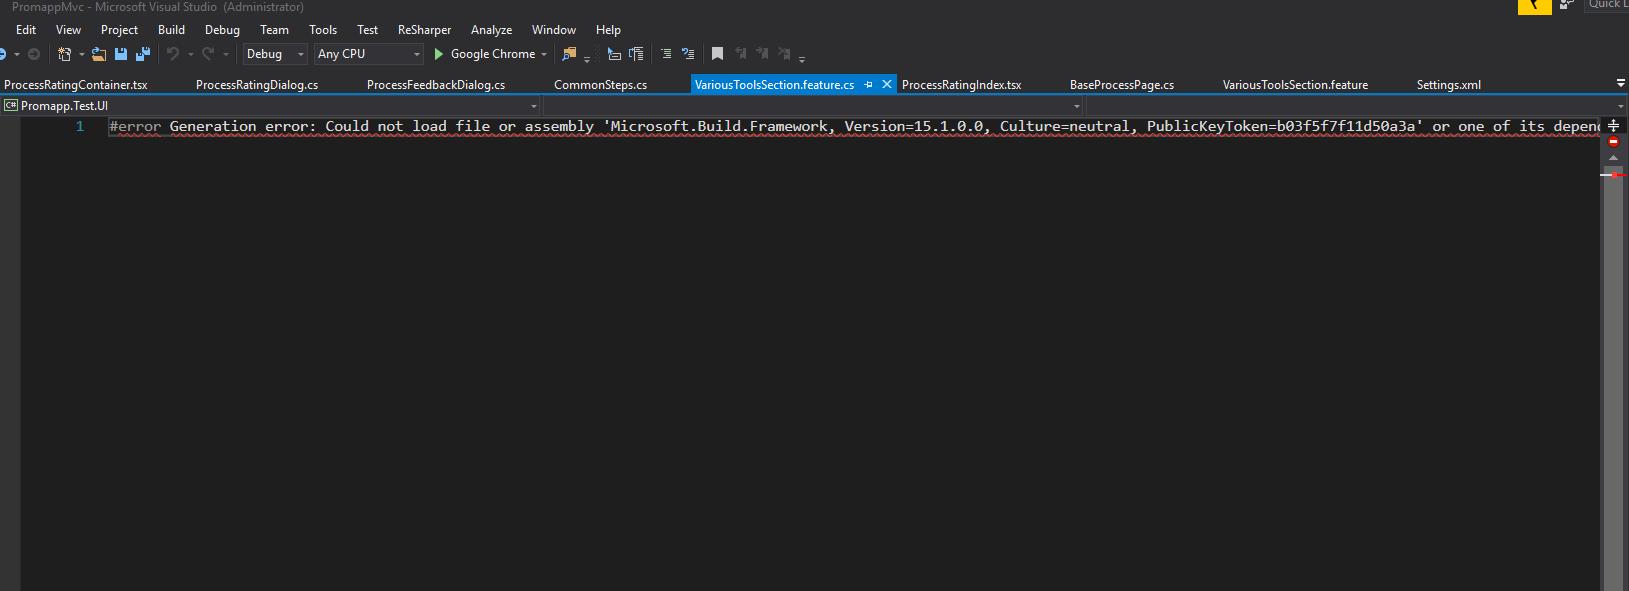 Developers - Visual Studio 2017 Generation error: Could not